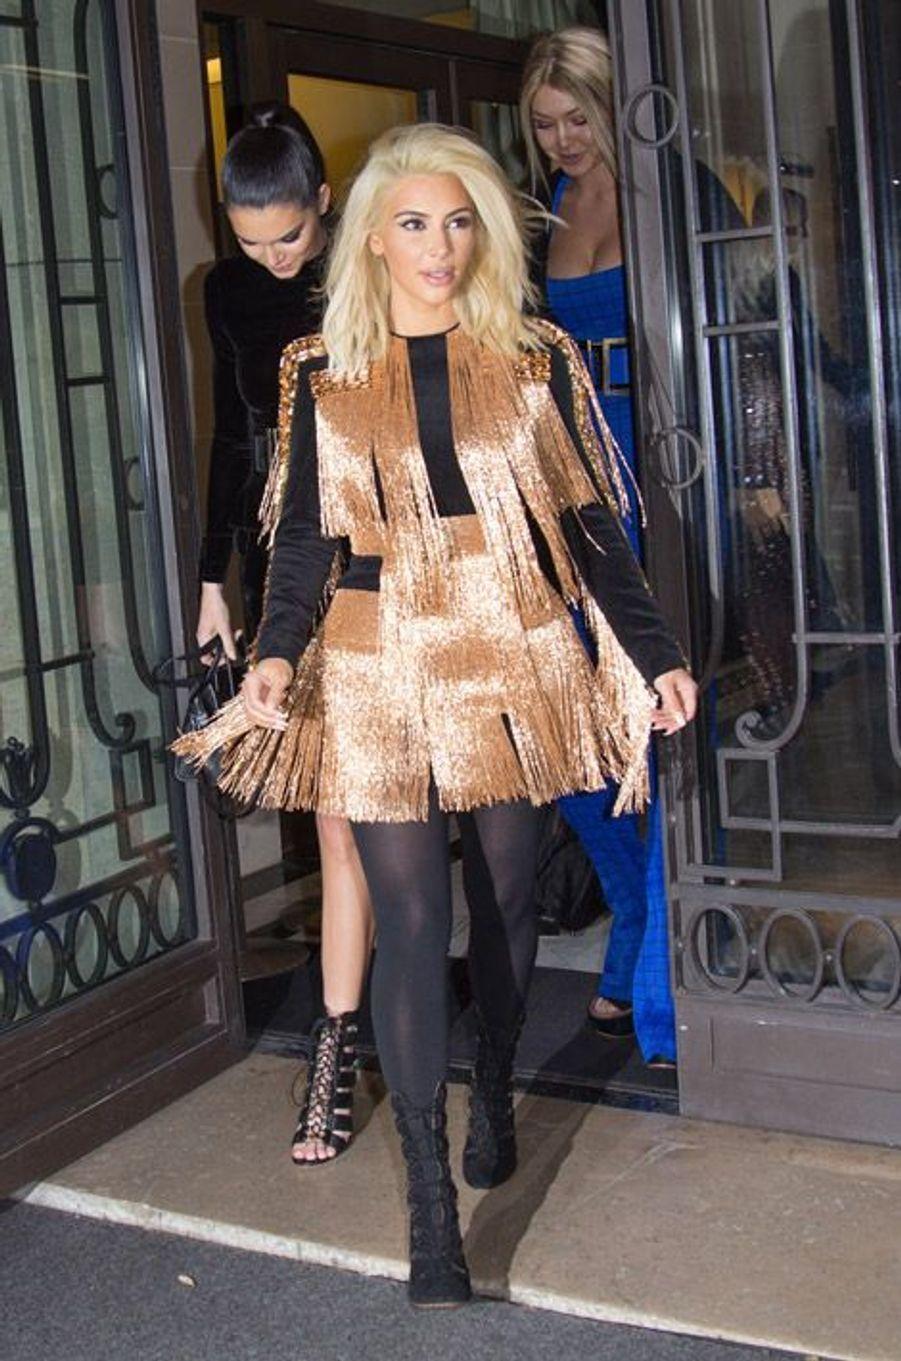 Kim Kardashian en Balmain sort de son hôtel à Paris, le 5 mars 2015